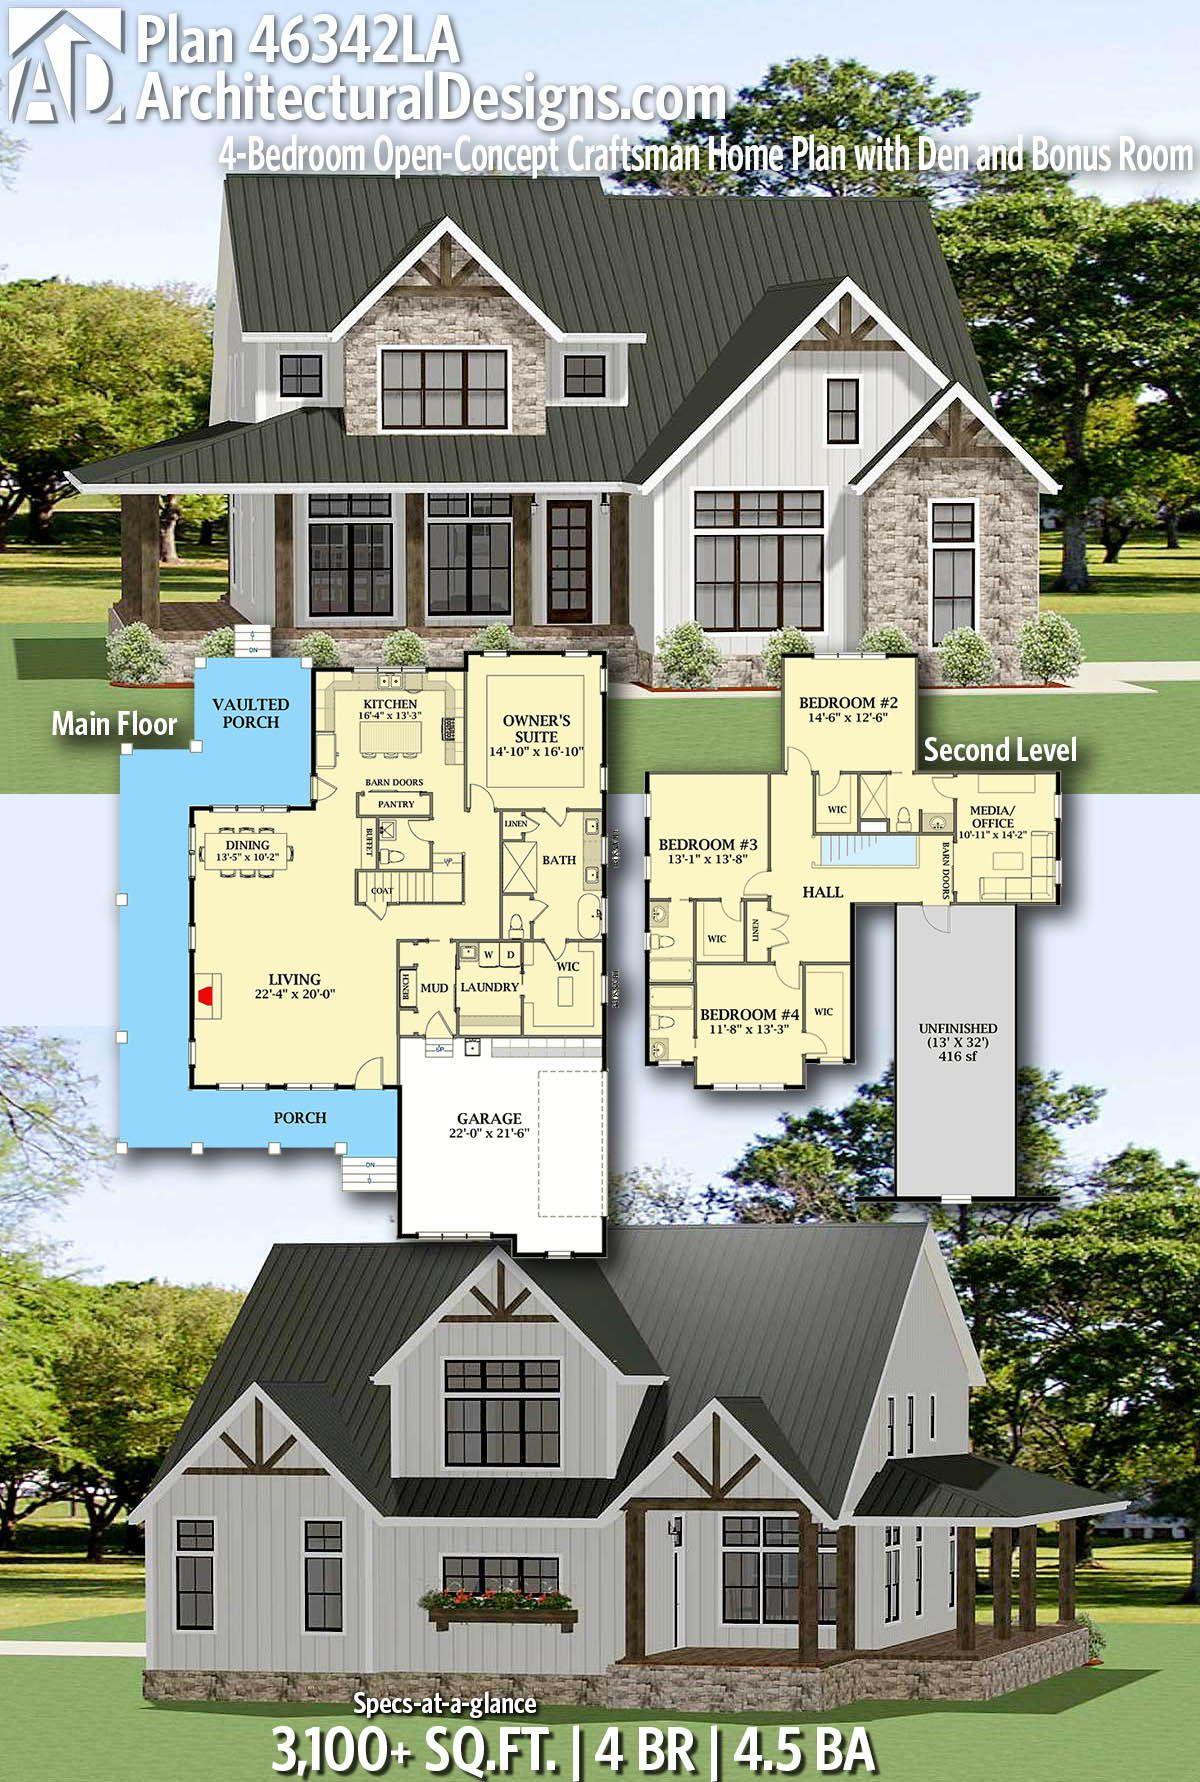 Plan 46342la 4 Bedroom Open Concept Craftsman Home Plan With Den And Bonus Room Craftsman House Plans House Plans Farmhouse House Plans